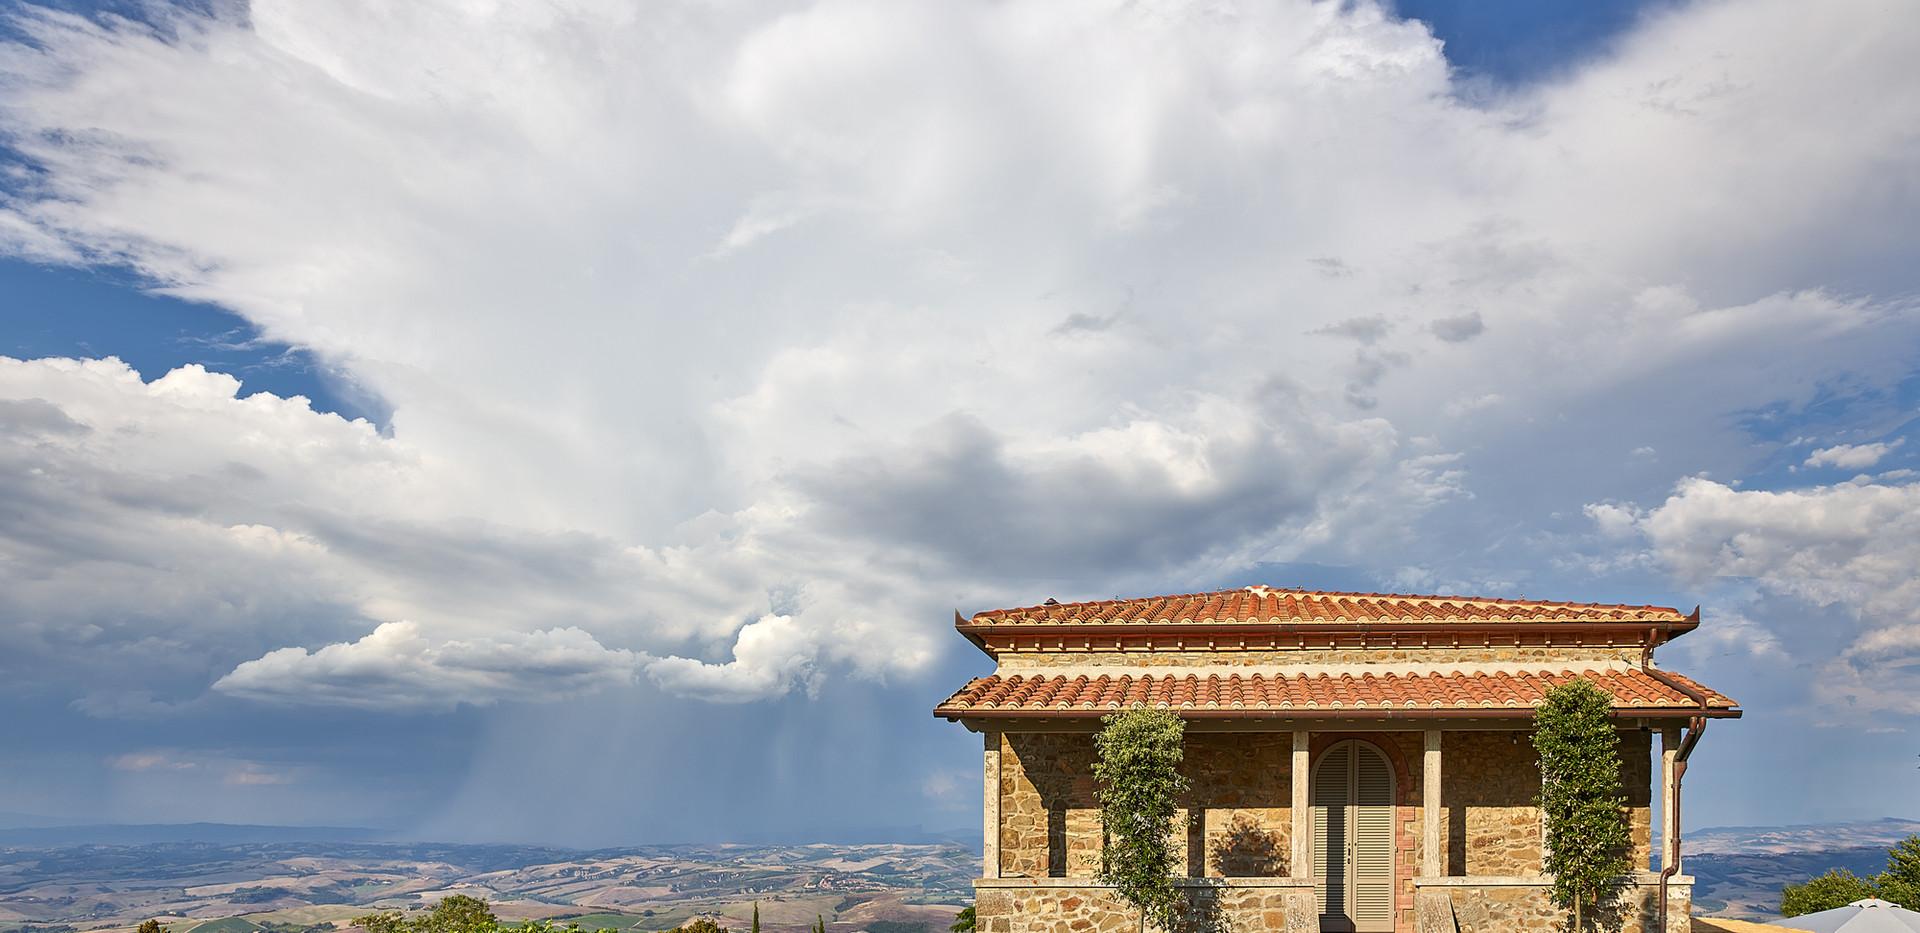 Villa Palazzetta-Aug 2018-0049.jpg